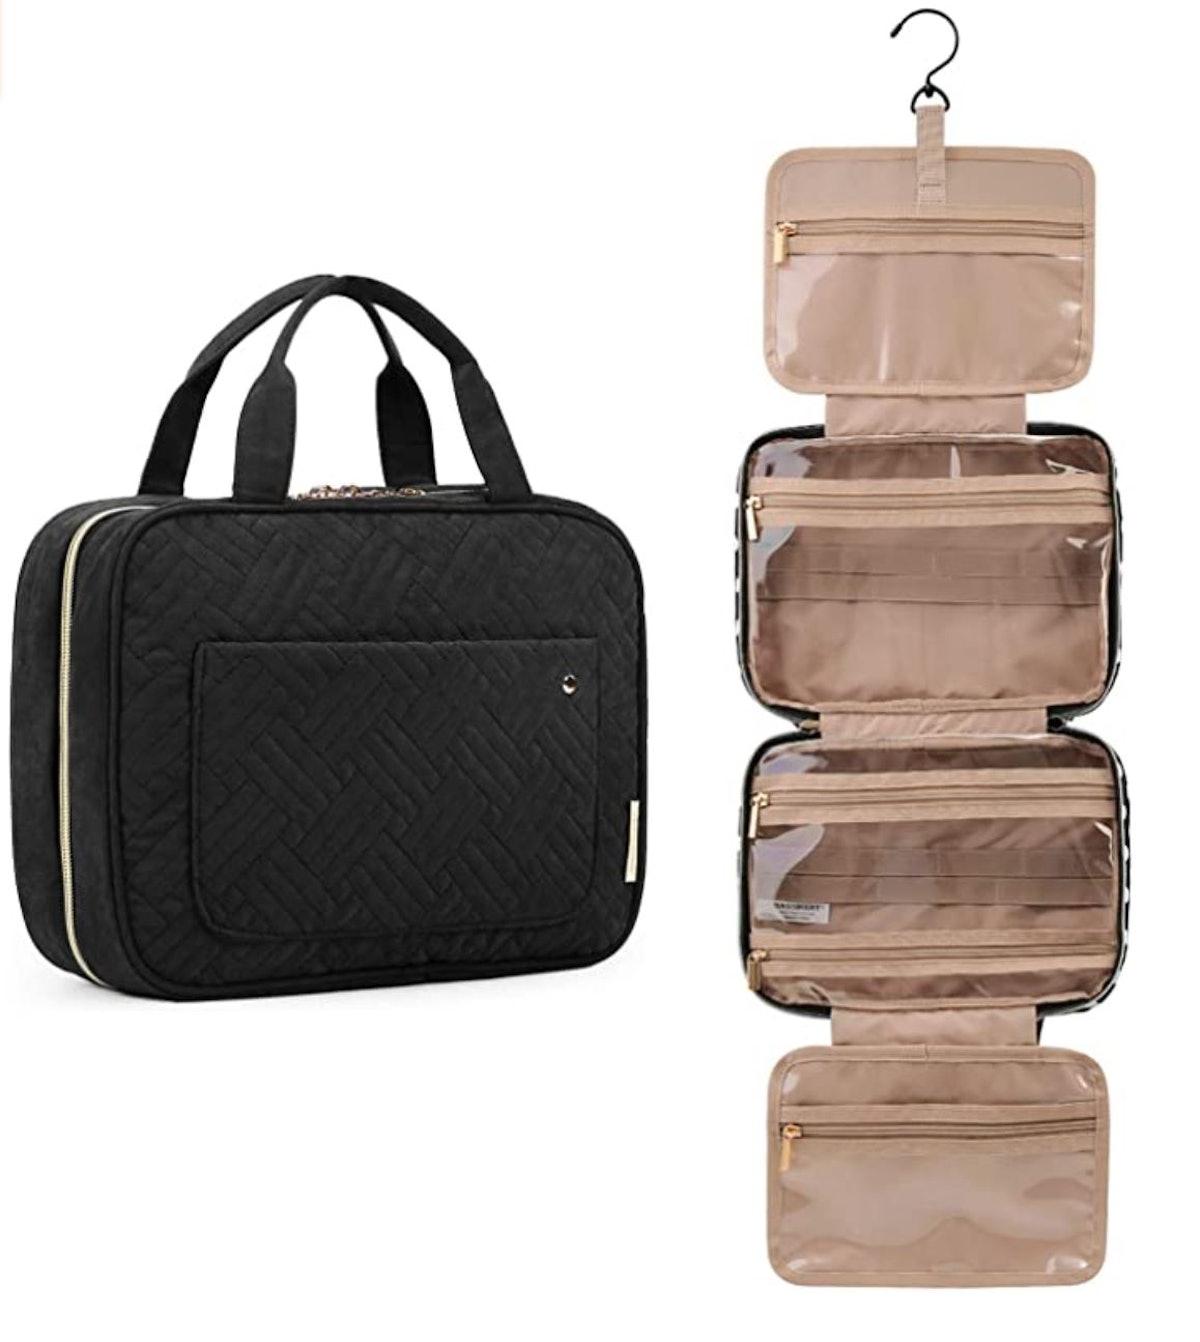 BAGSMART Toiletry Bag